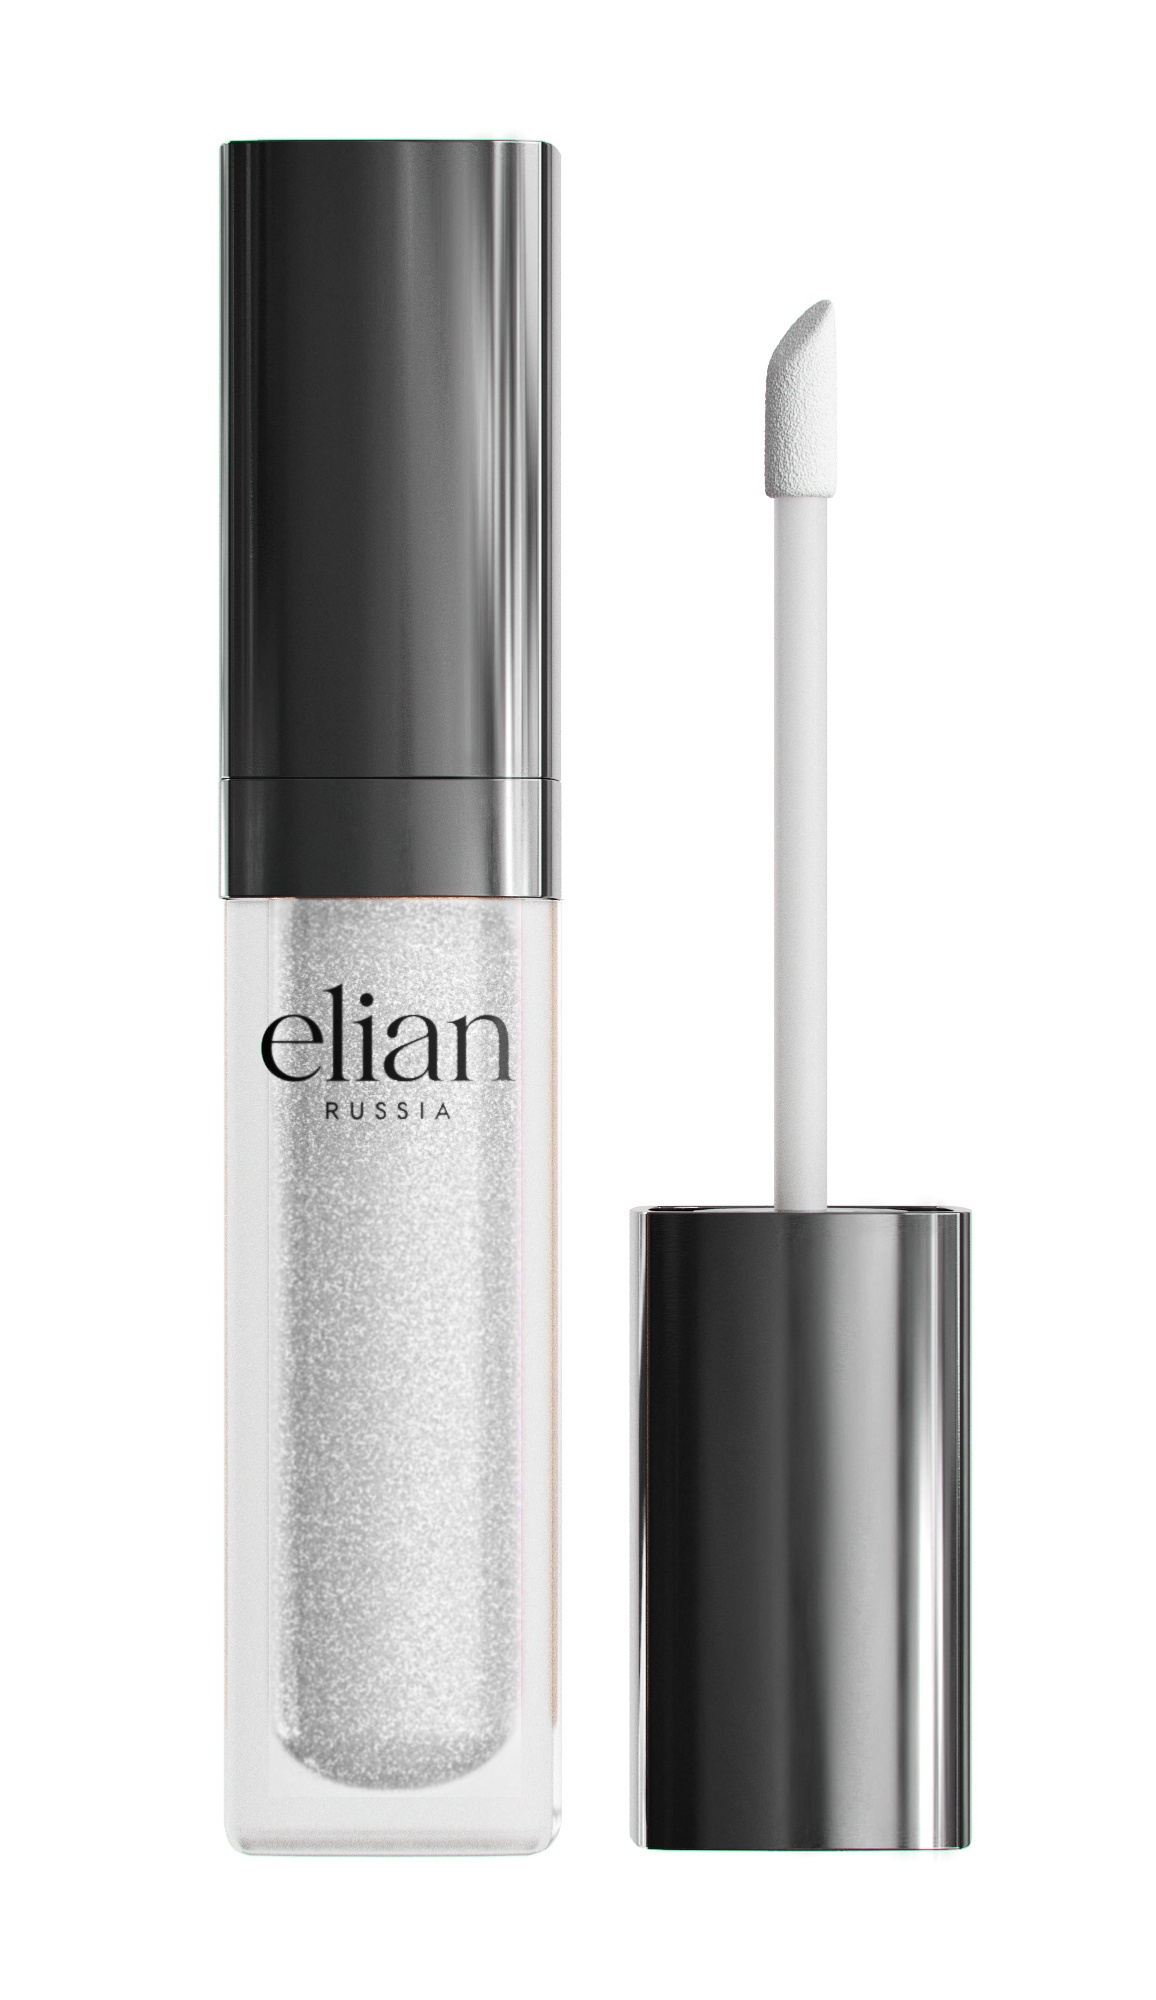 Блеск для губ ELIAN RUSSIA Extreme Shine Lip Gloss